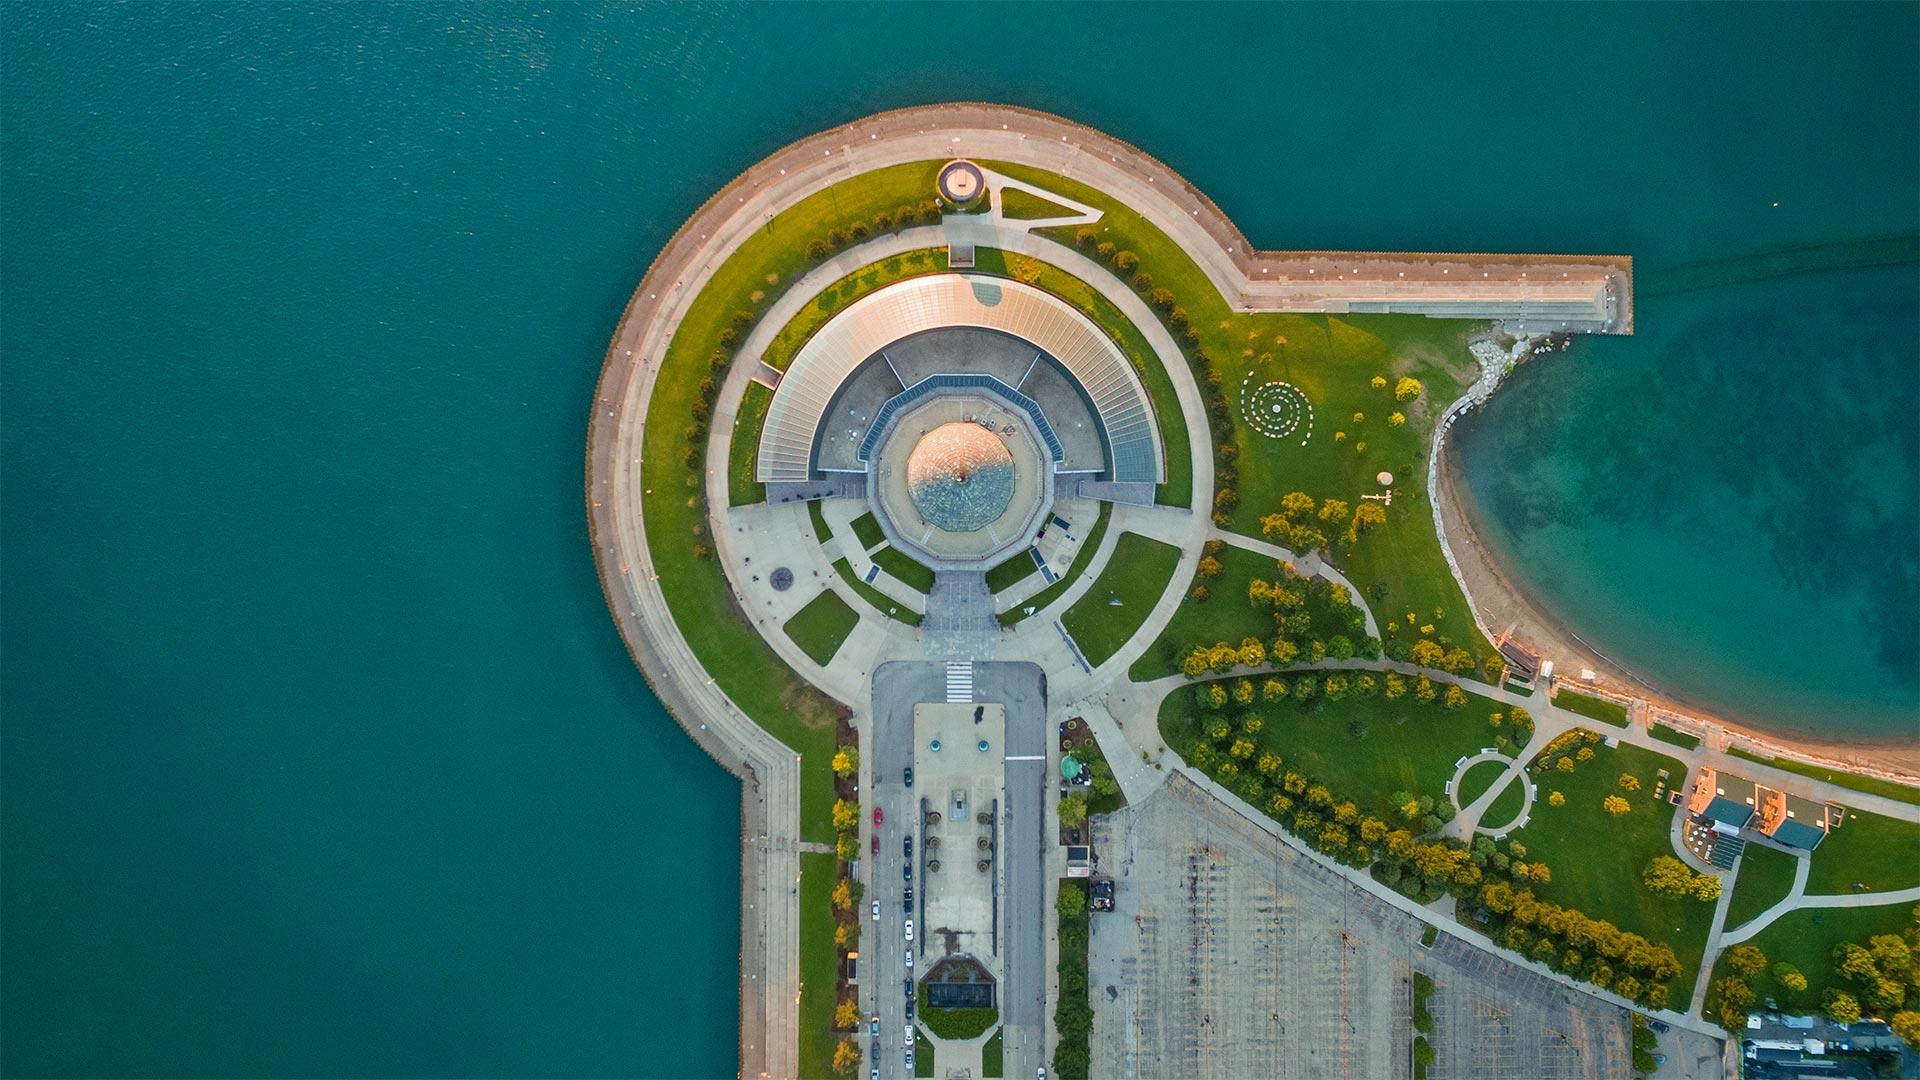 Adler Planetarium, Chicago, Illinois, USA (? Amazing Aerial Agency/Offset by Shutterstock)